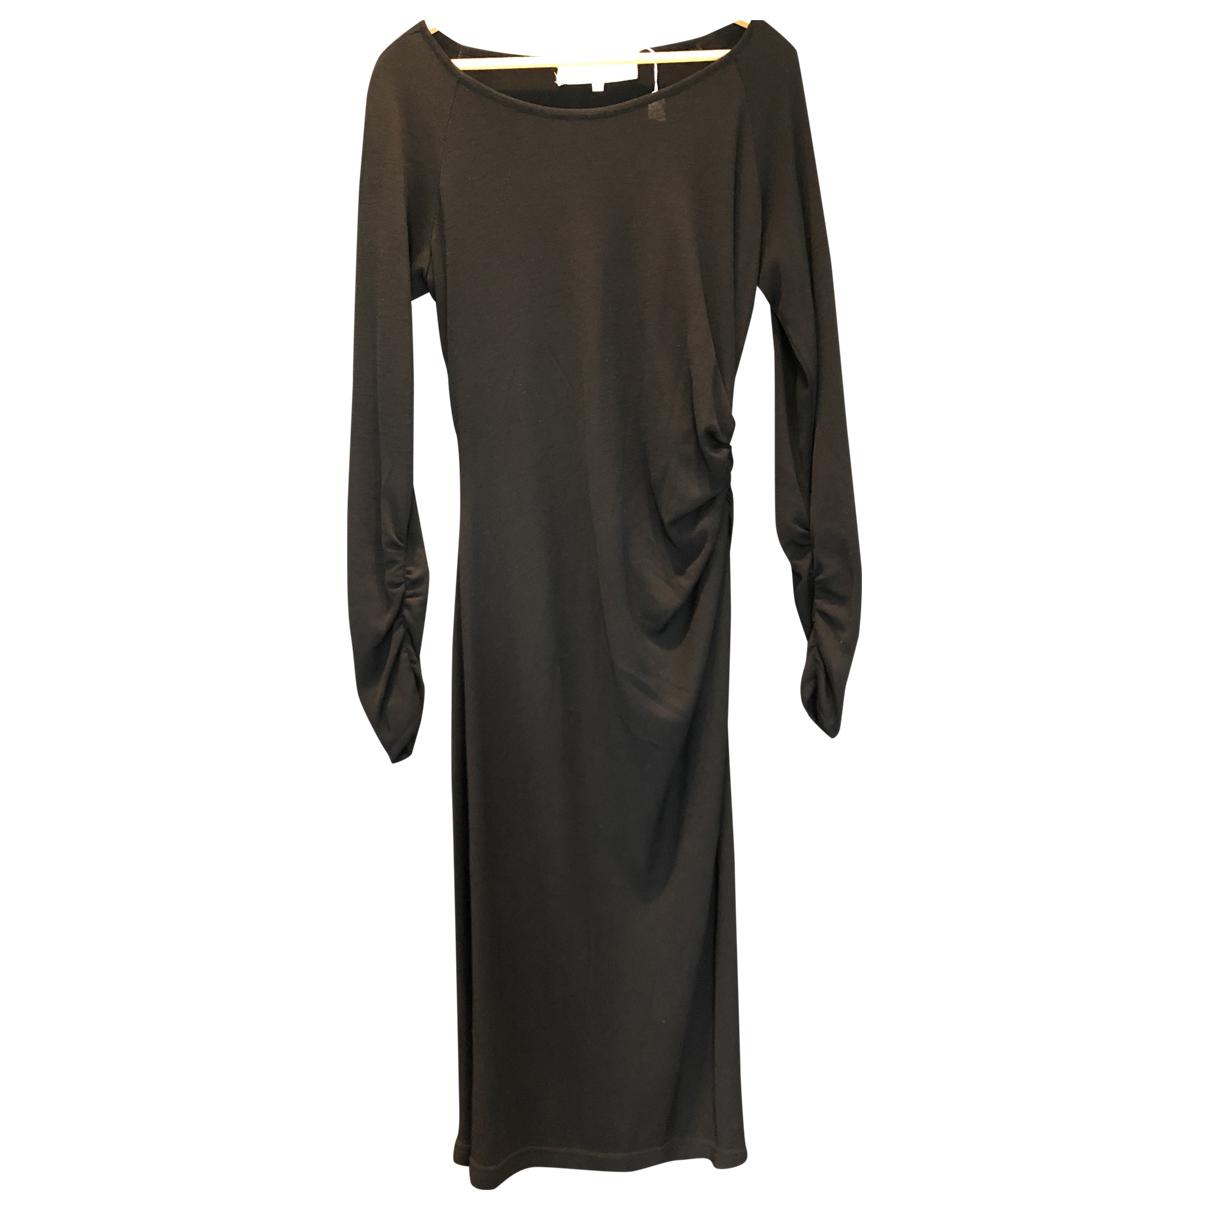 Emanuel Ungaro N Black Wool dress for Women 14 UK